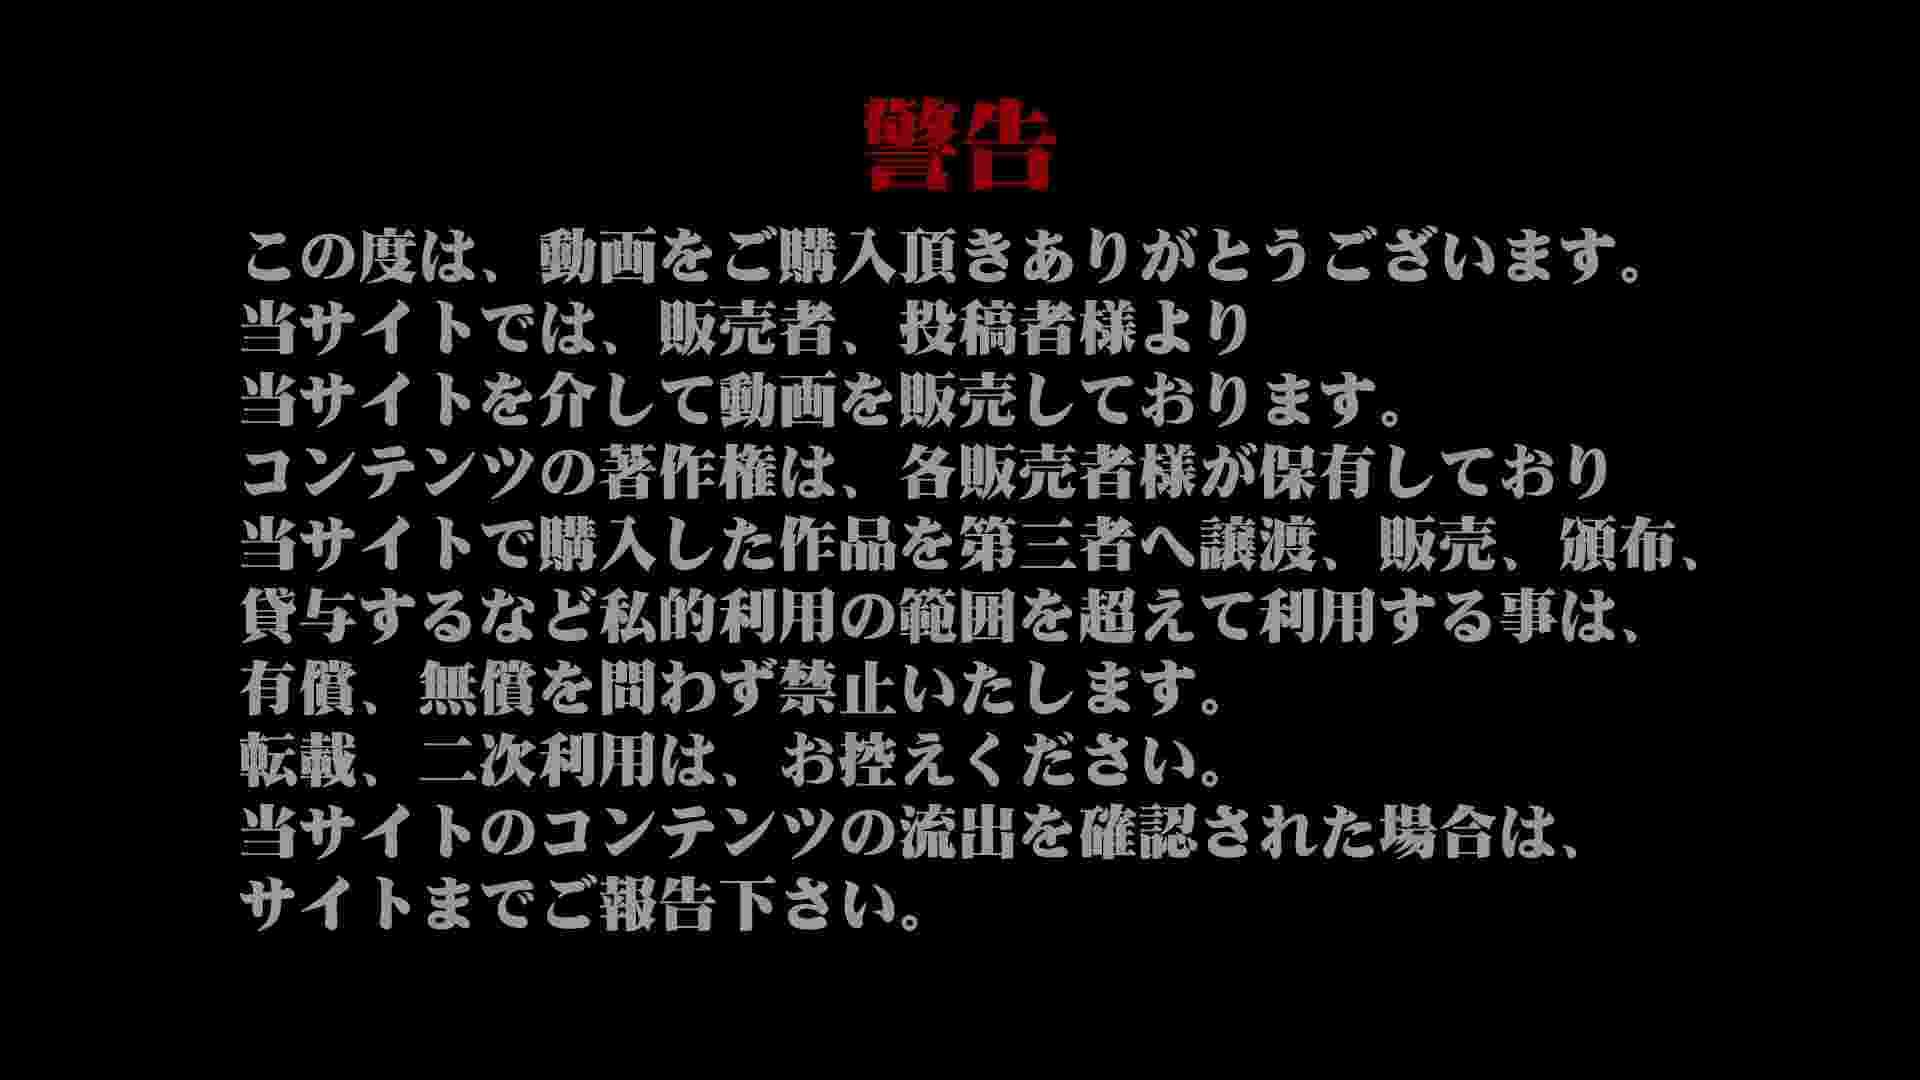 Aquaな露天風呂Vol.951 盗撮映像  93Pix 1